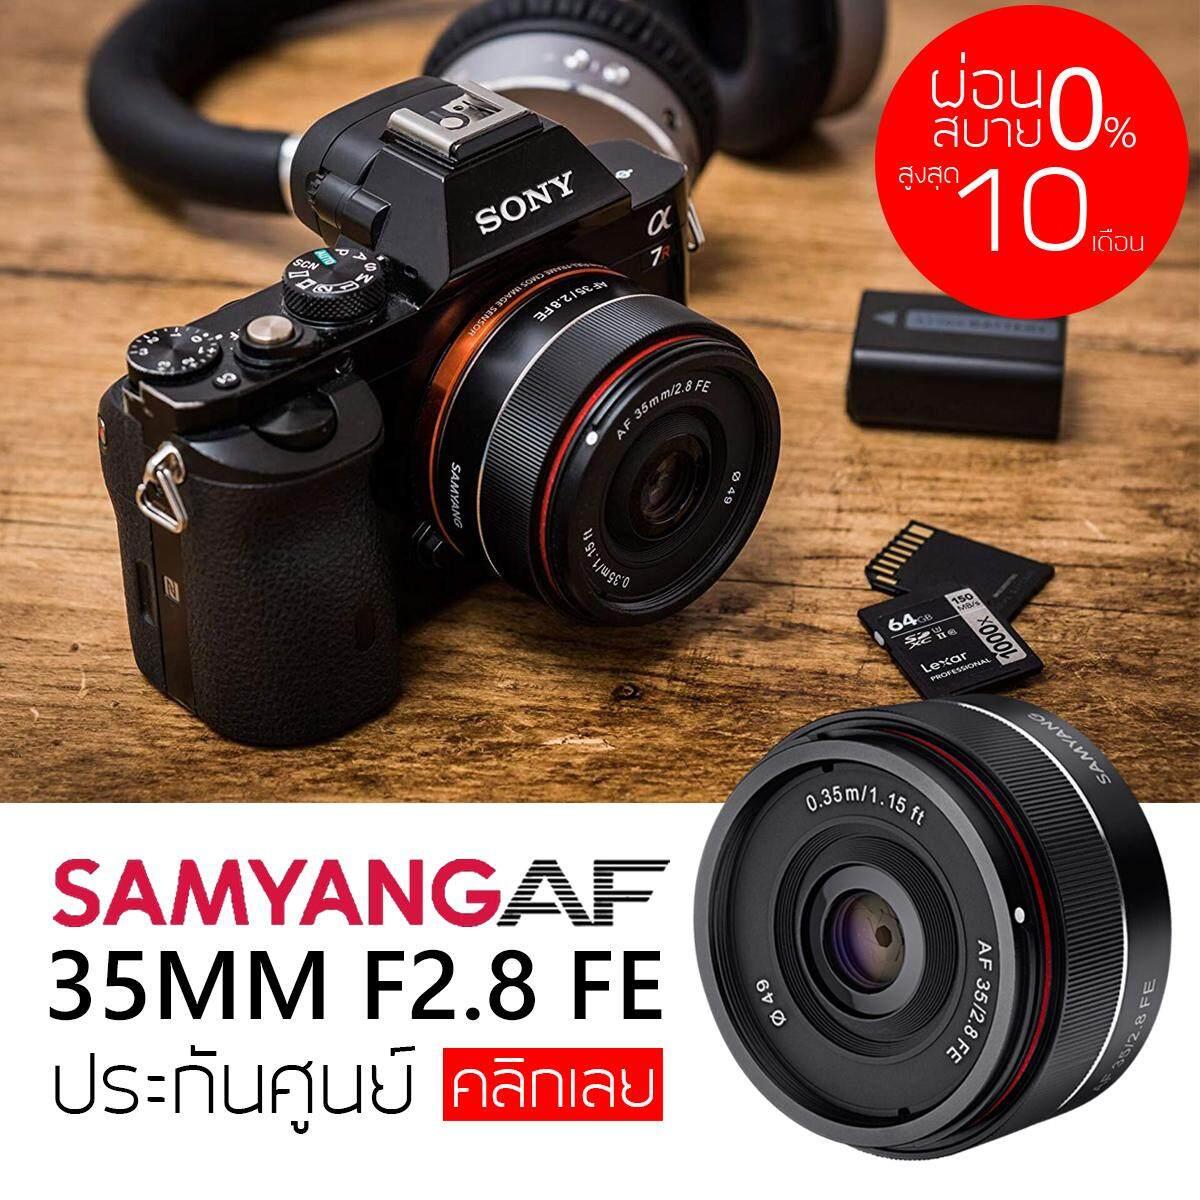 Samyang Af 35mm F2.8 - Sony E (ประกันศูนย์) [ผ่อน 0% 10เดือน].